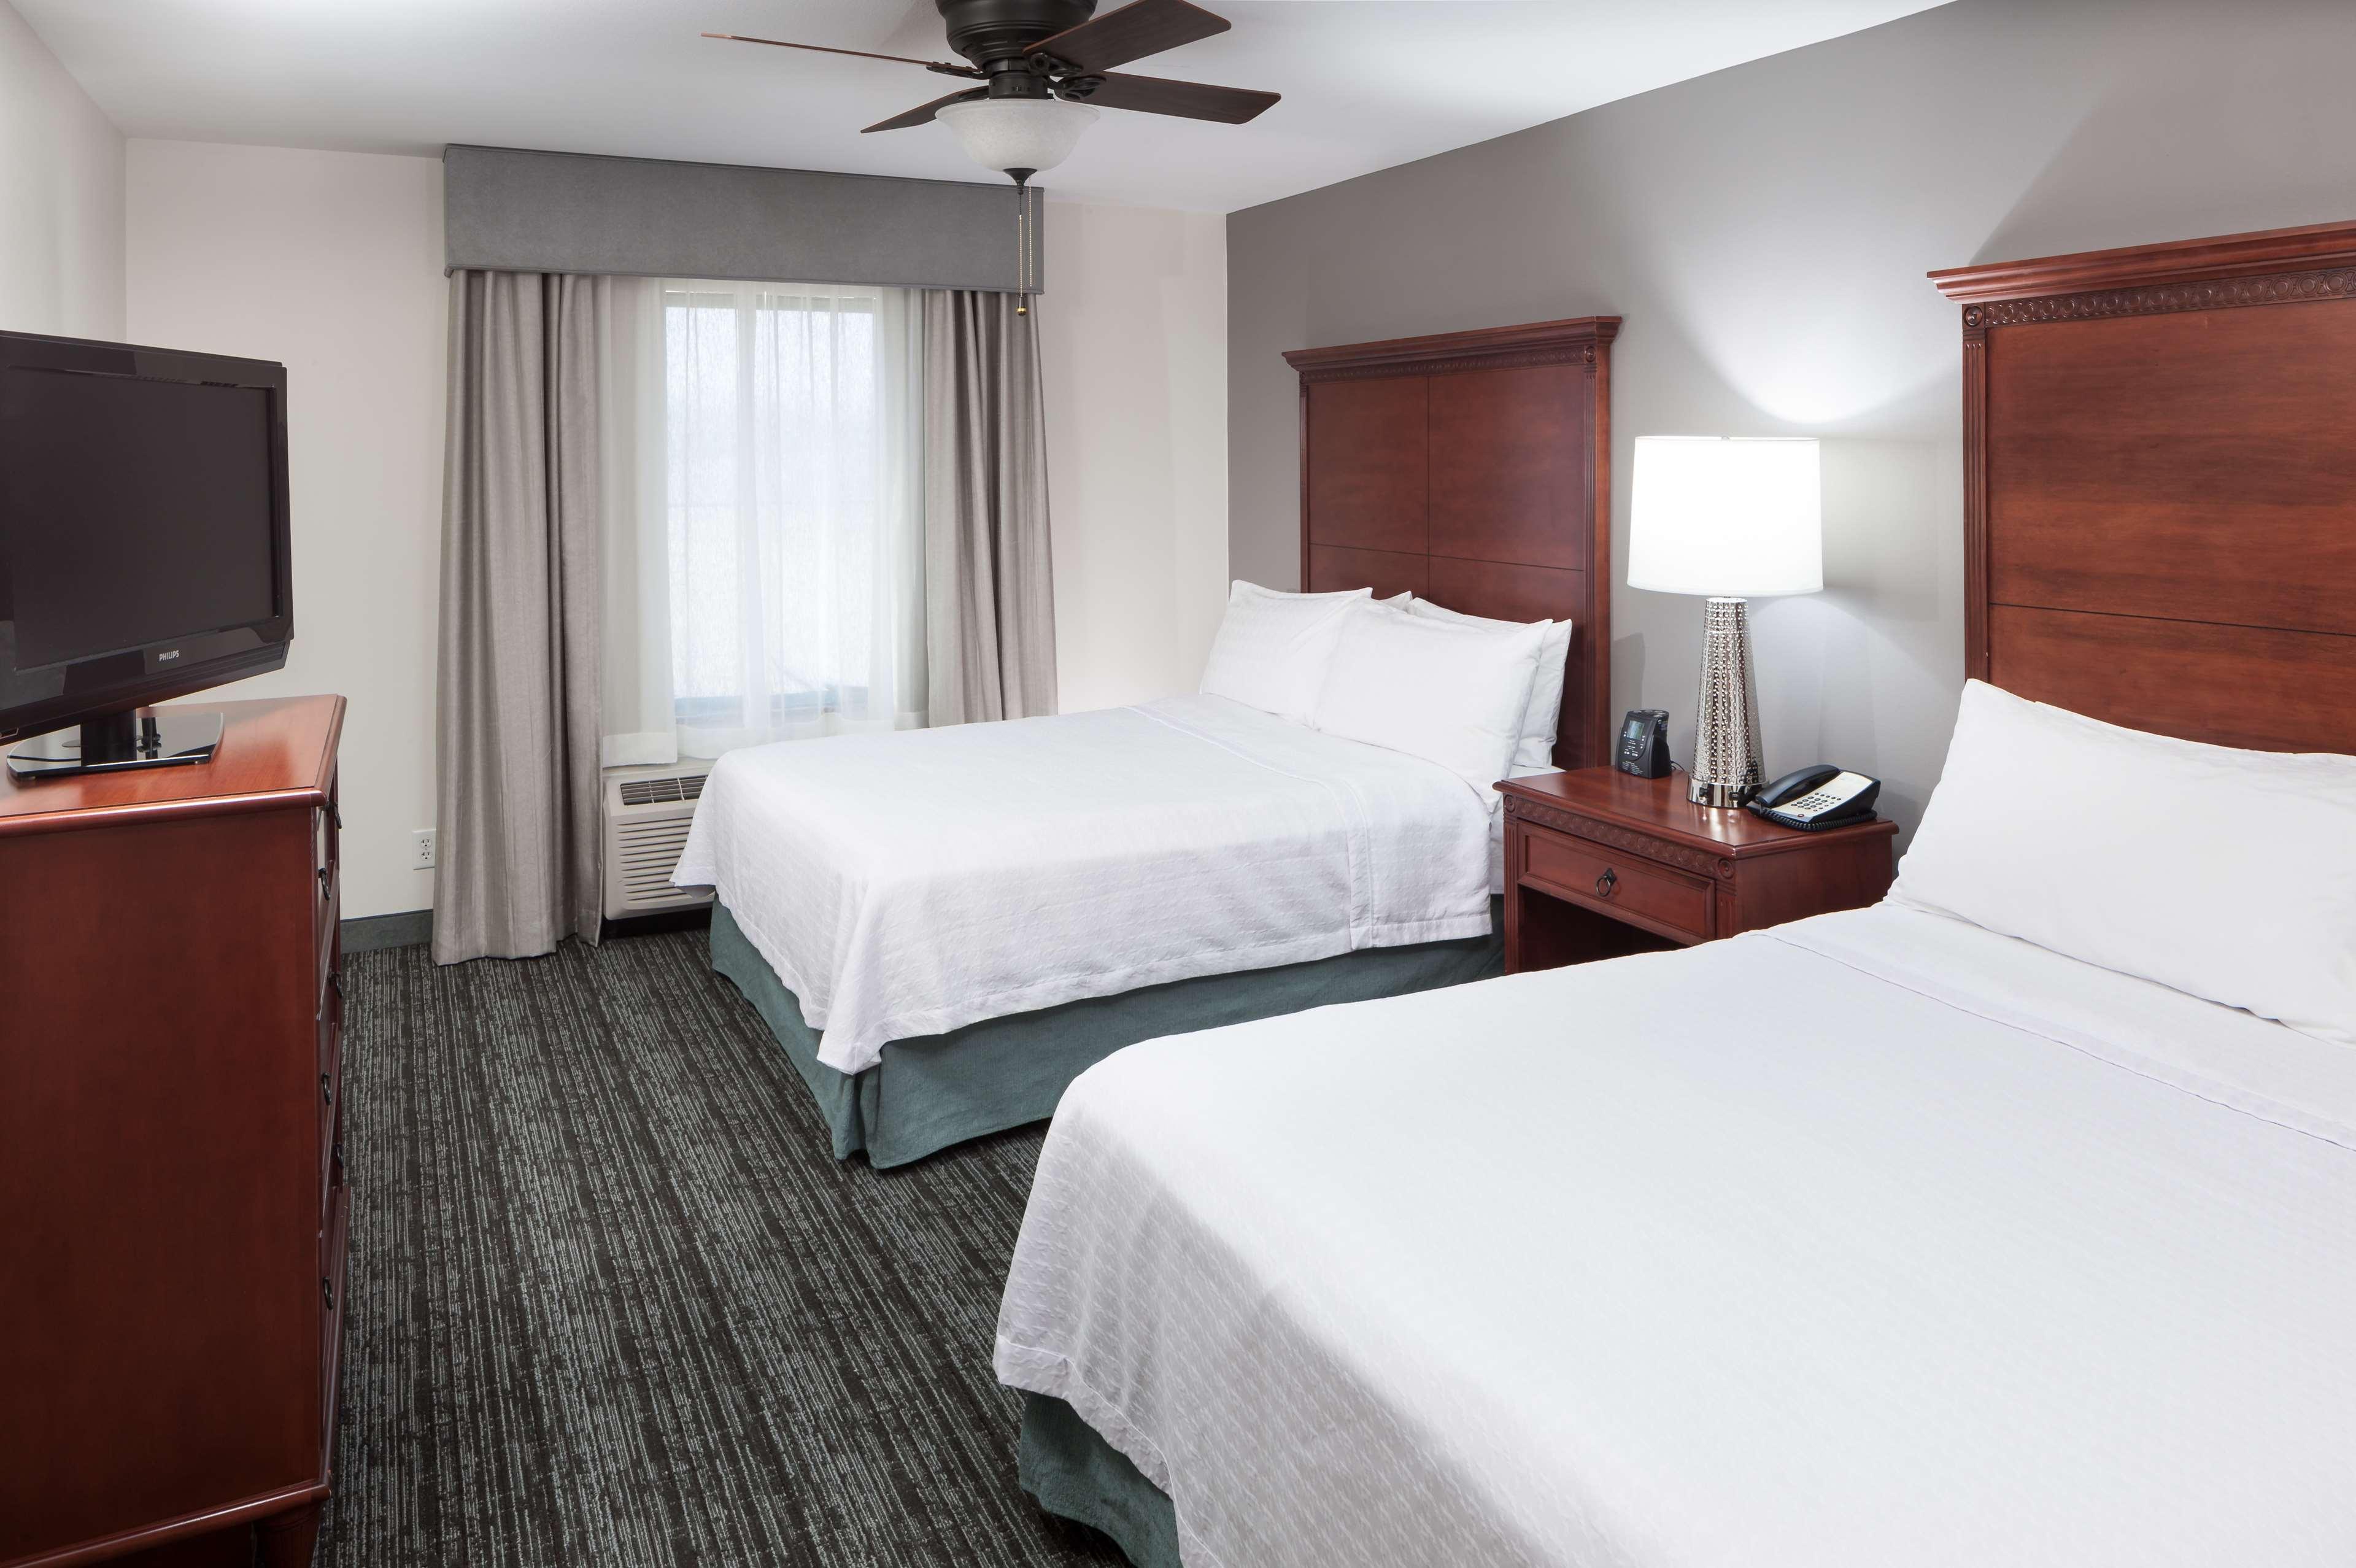 Homewood Suites by Hilton Denton image 27